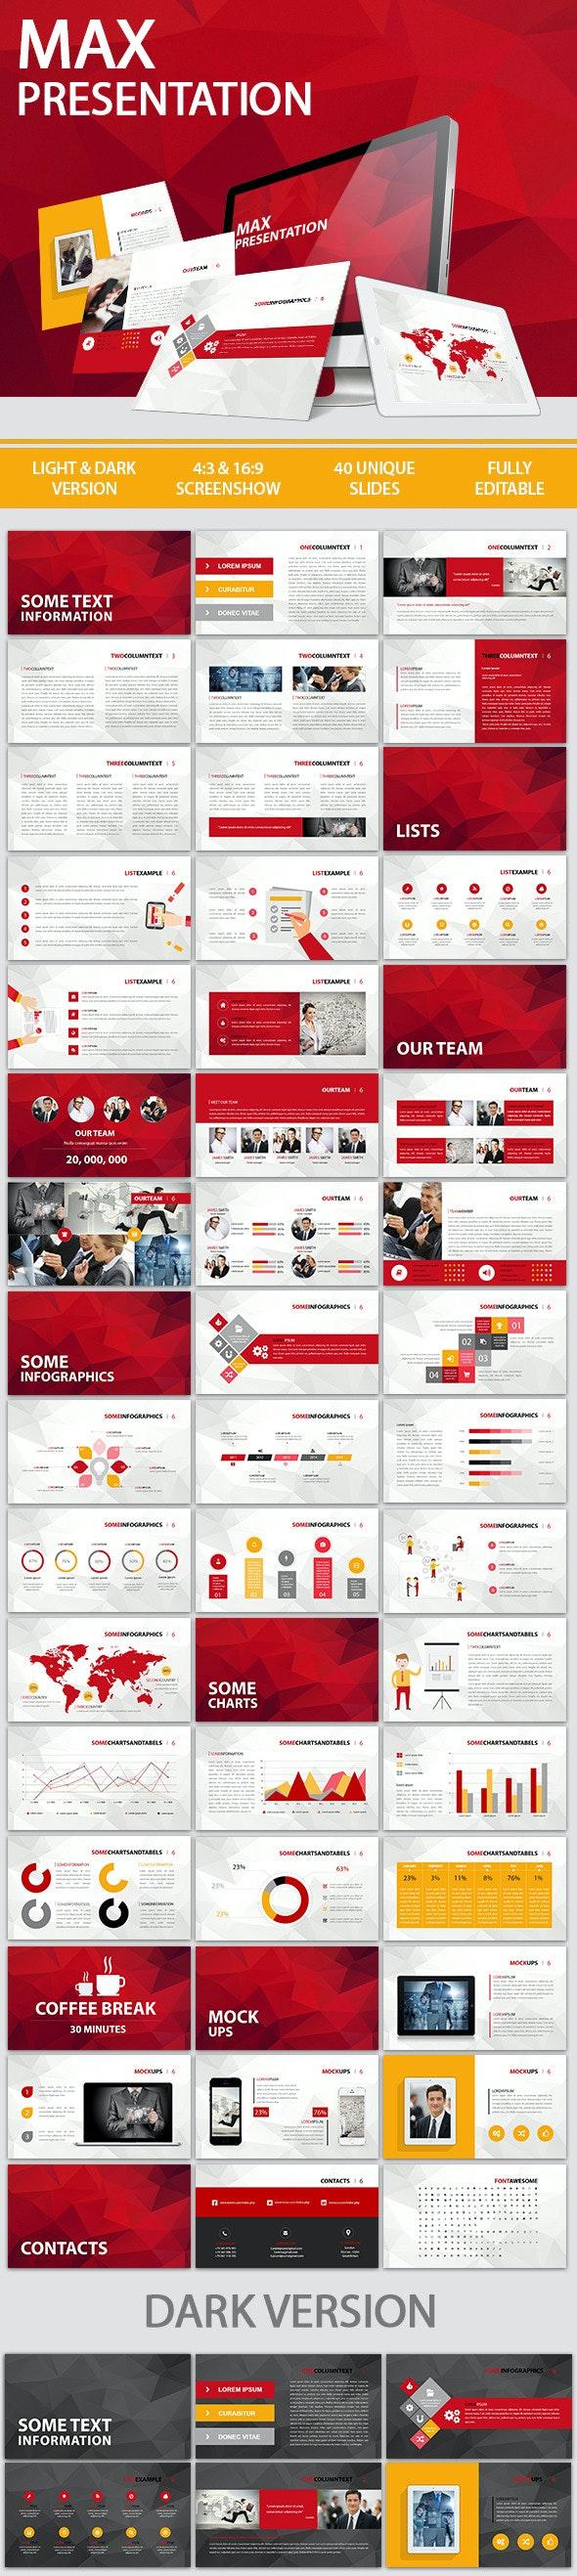 Max Presentation - PowerPoint Templates Presentation Templates